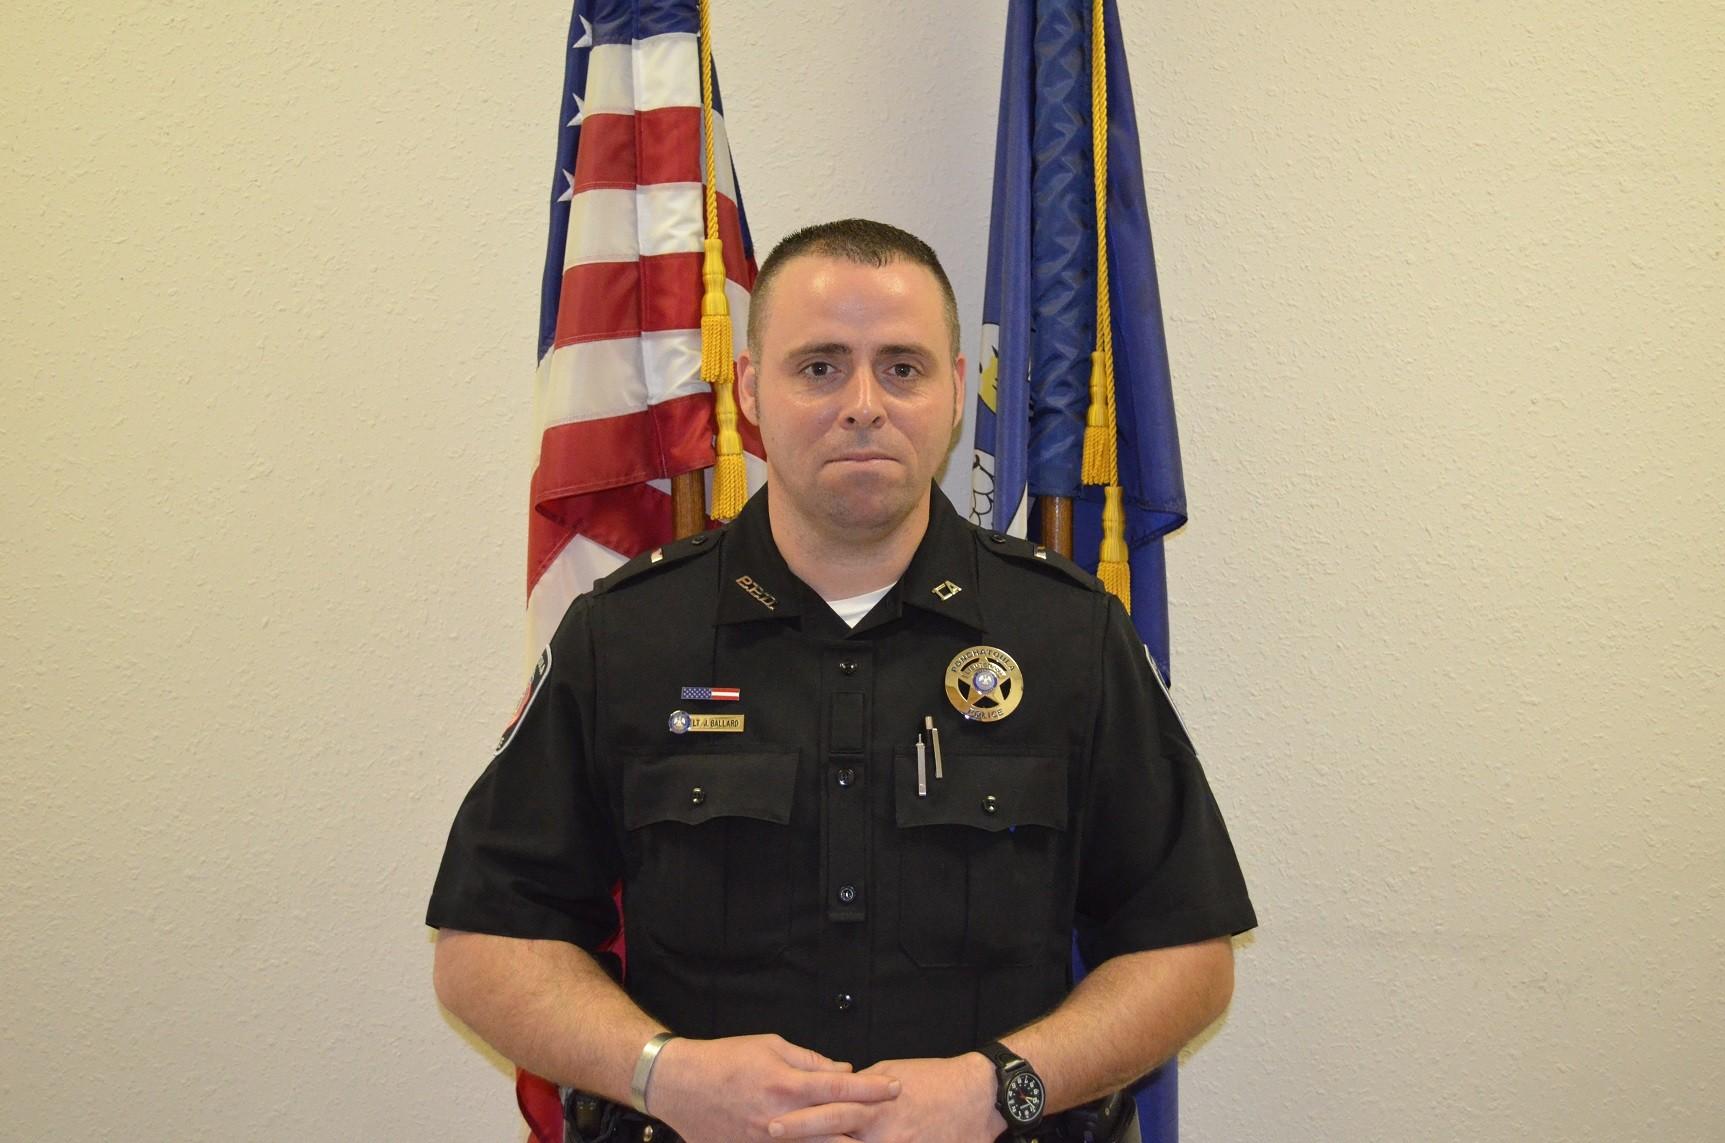 Lt. Jeremy Ballard